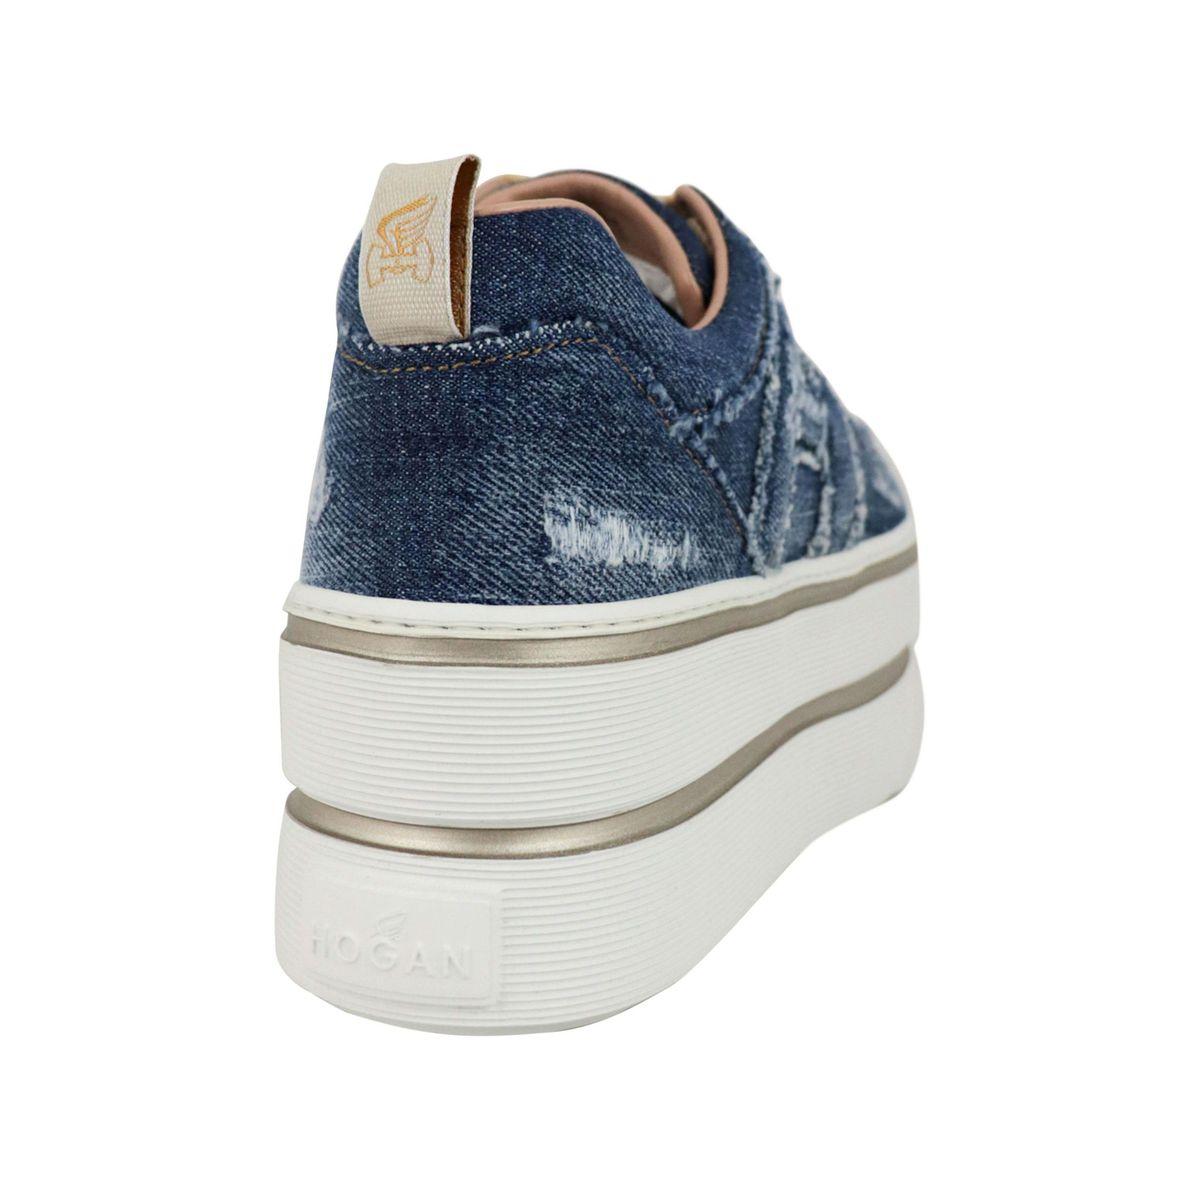 Maxi sneakers in denim canvas Blue jeans Hogan